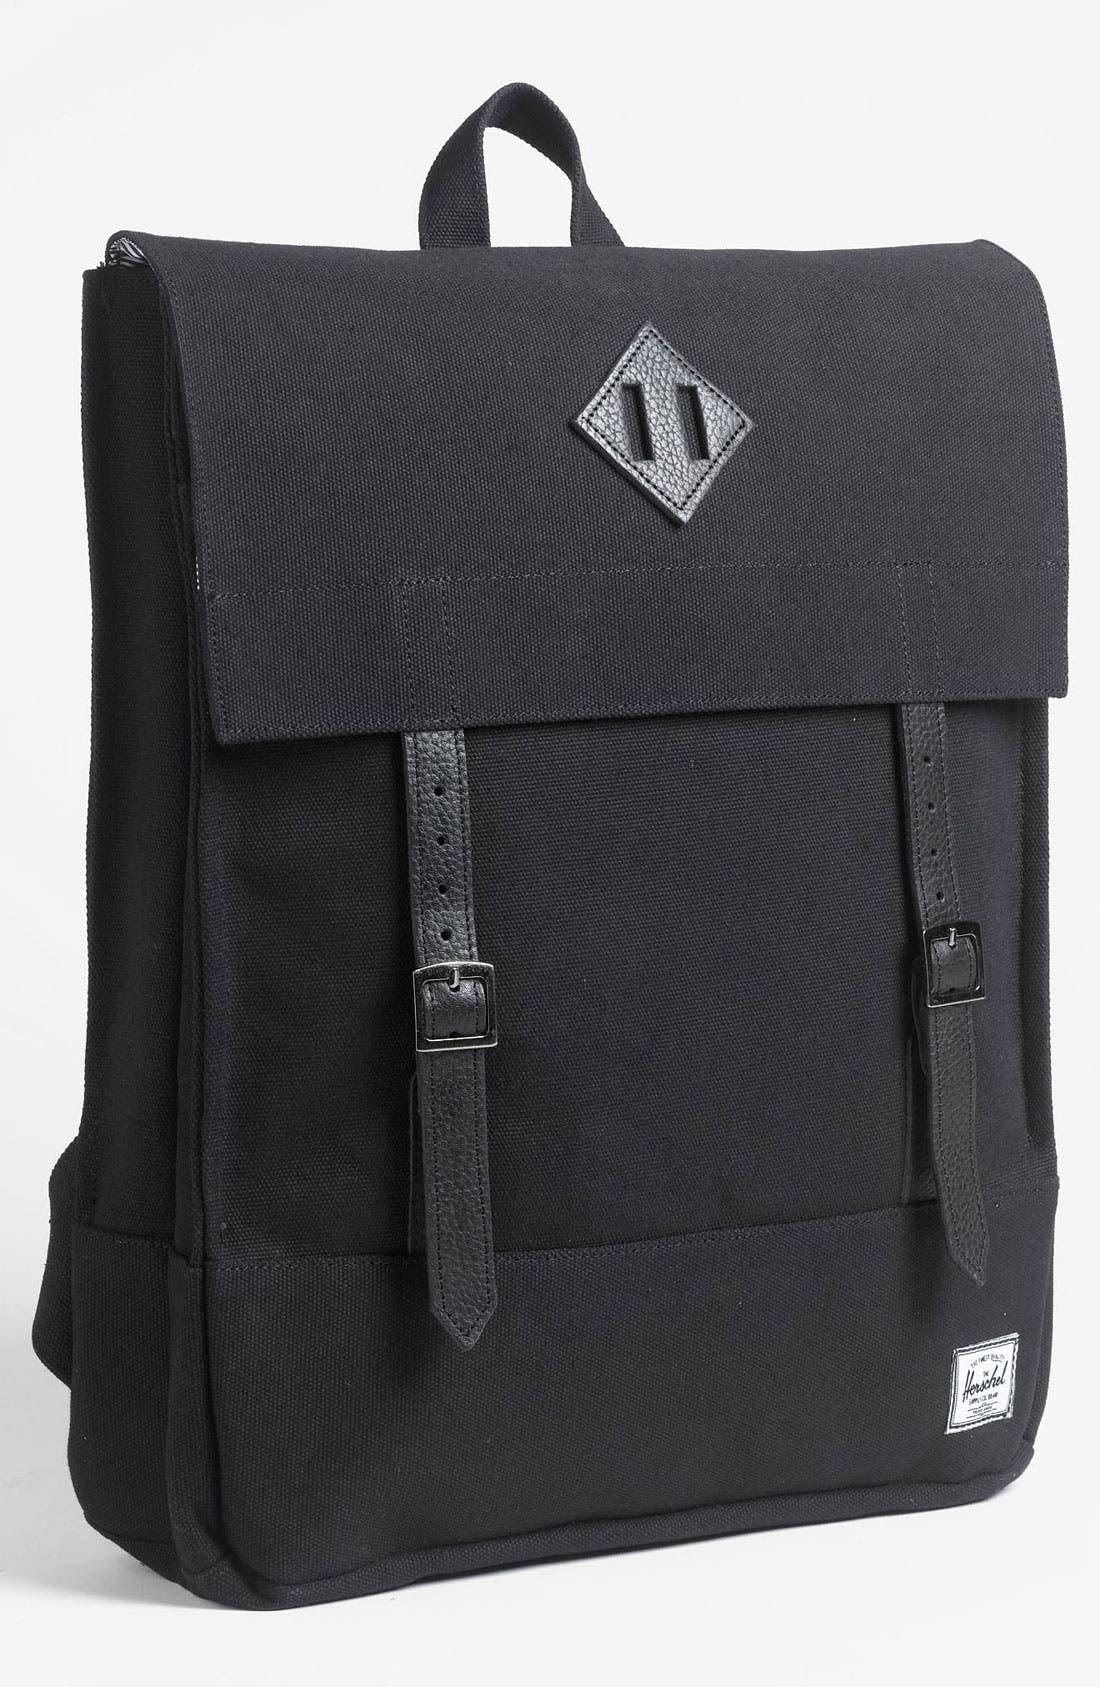 Alternate Image 1 Selected - Herschel Supply Co. 'Survey' Backpack